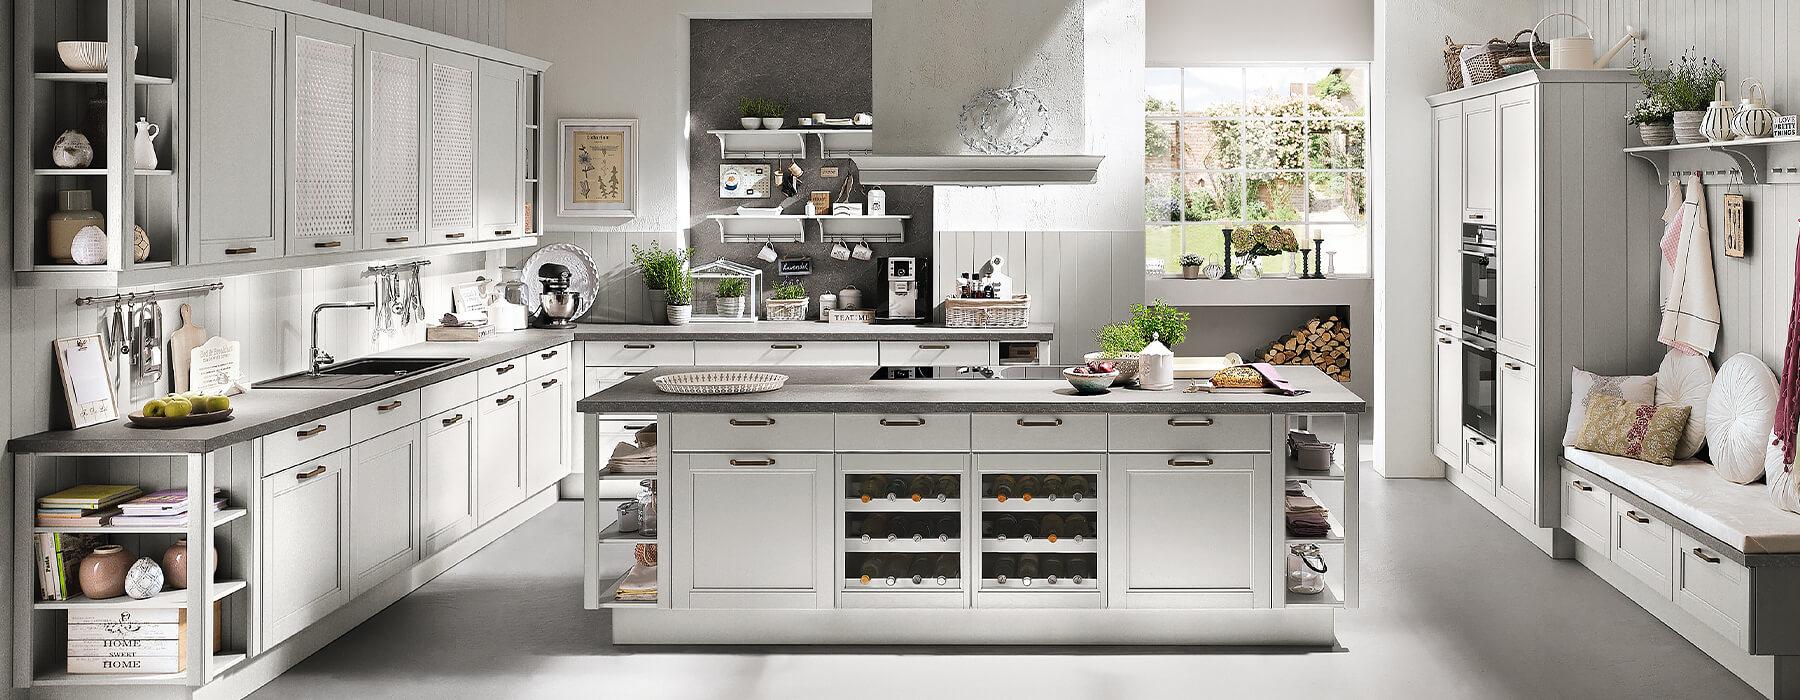 Nobilia Castello Trendy Stylish Kitchens Designs With